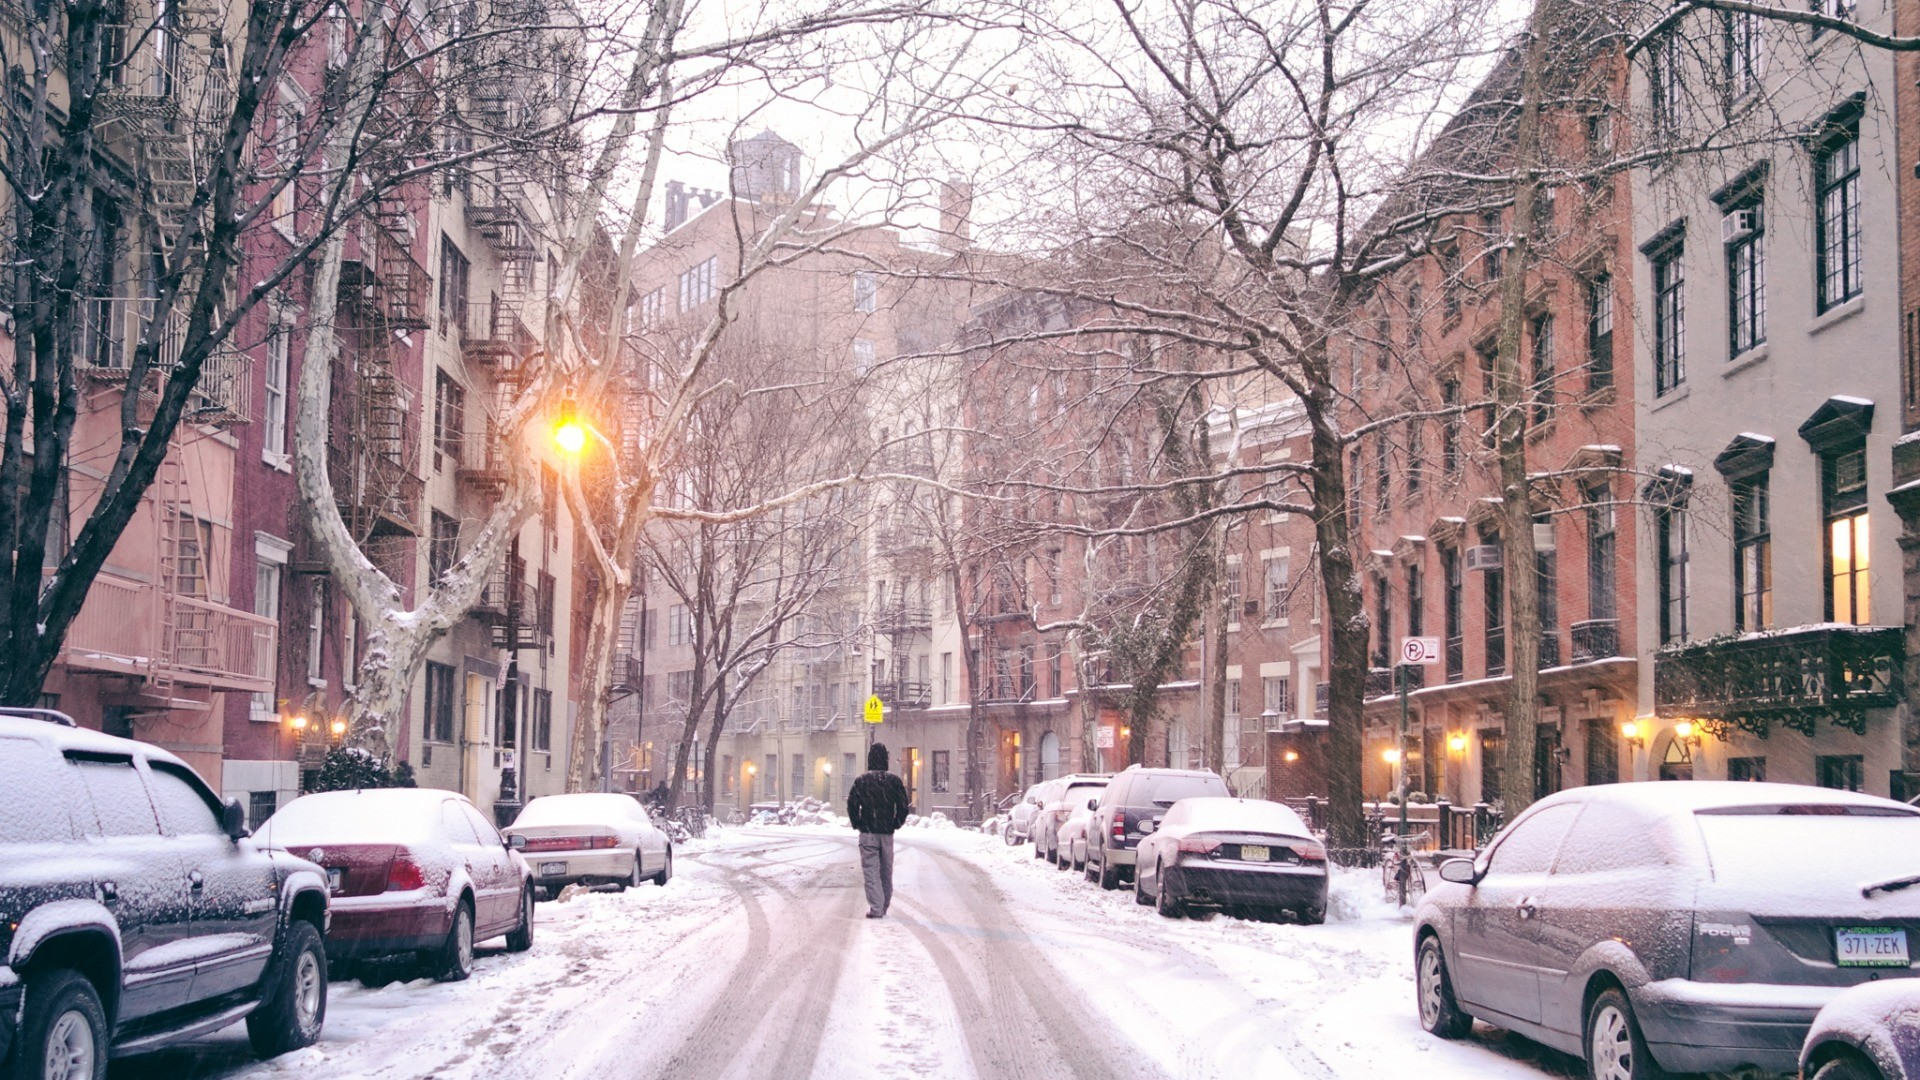 Wallpaper Save It New York Wallpaper Winter 1920x1080 Download Hd Wallpaper Wallpapertip